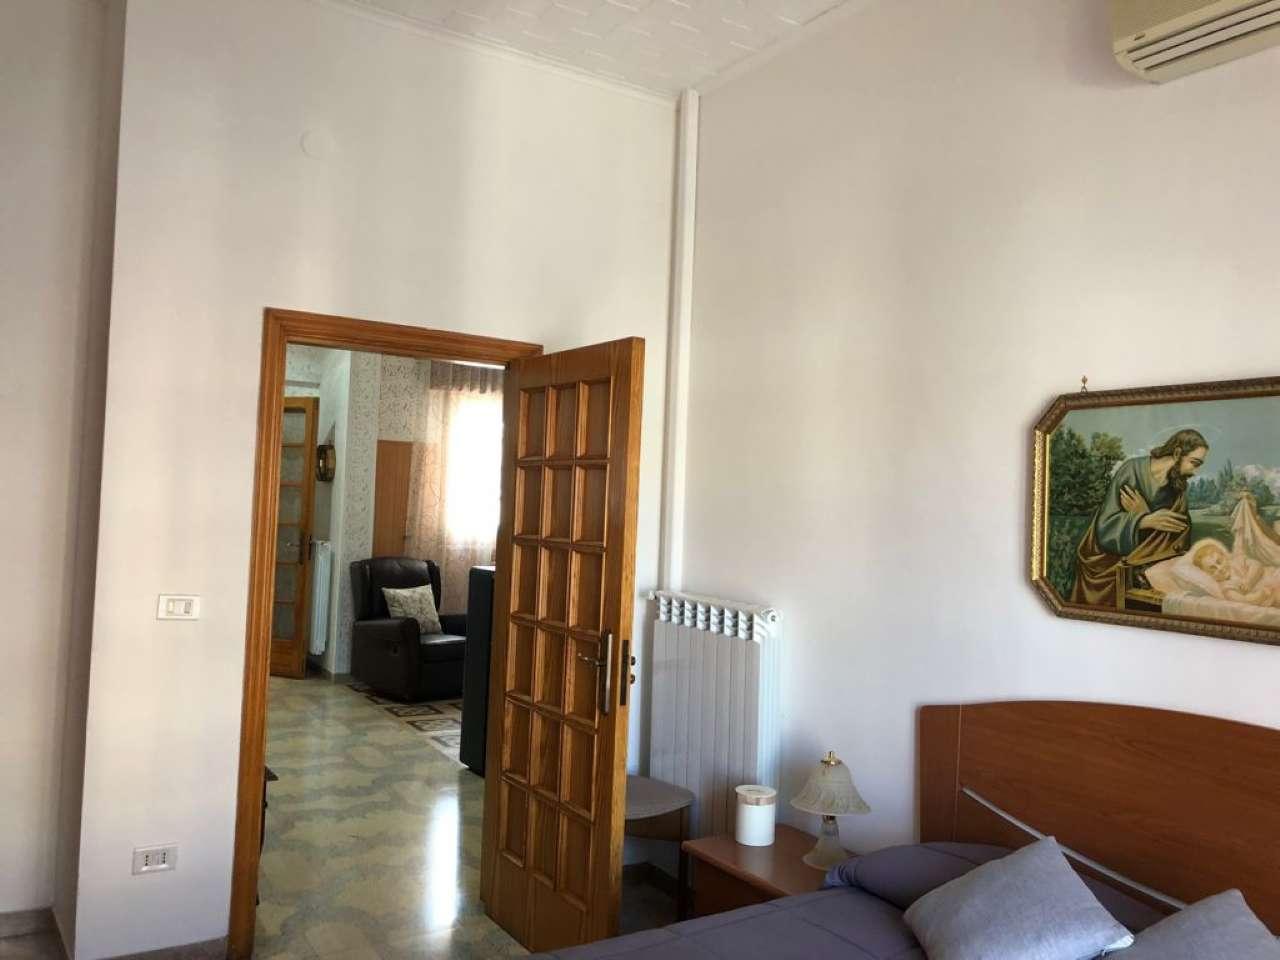 Trilocale, Via Maraschi, zona centro, Manduria, foto 11